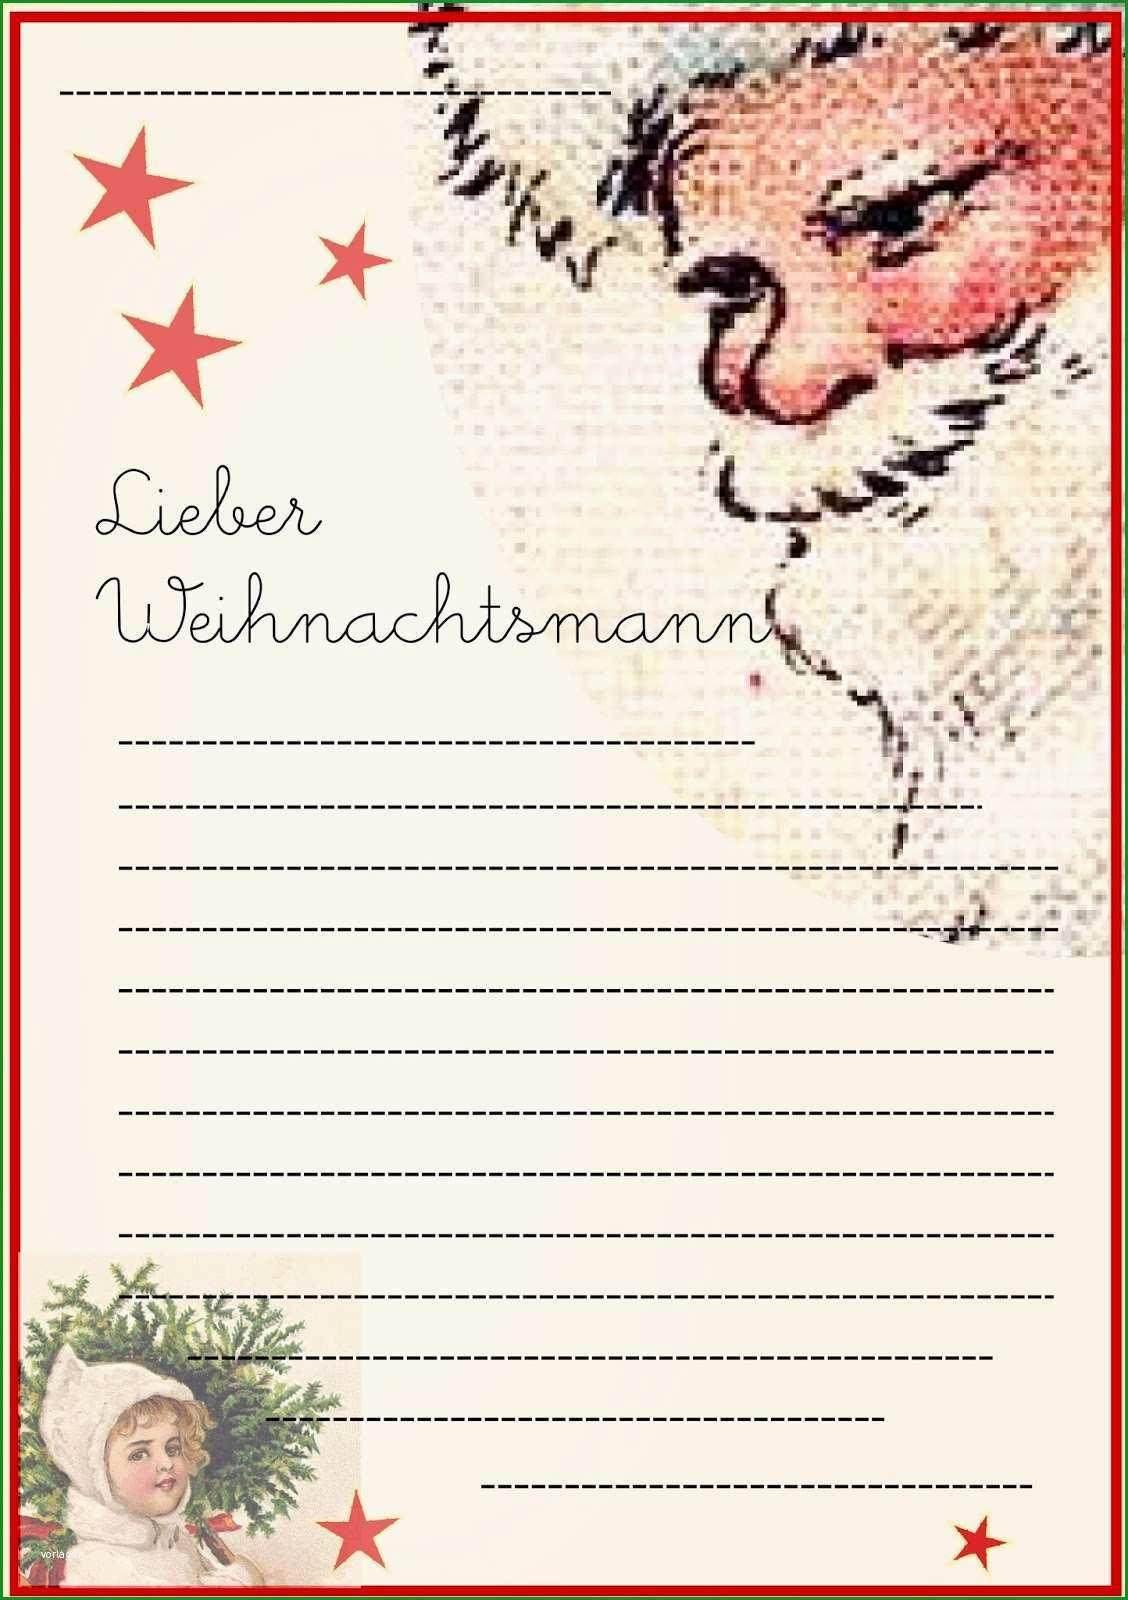 free printable letter to santa claus